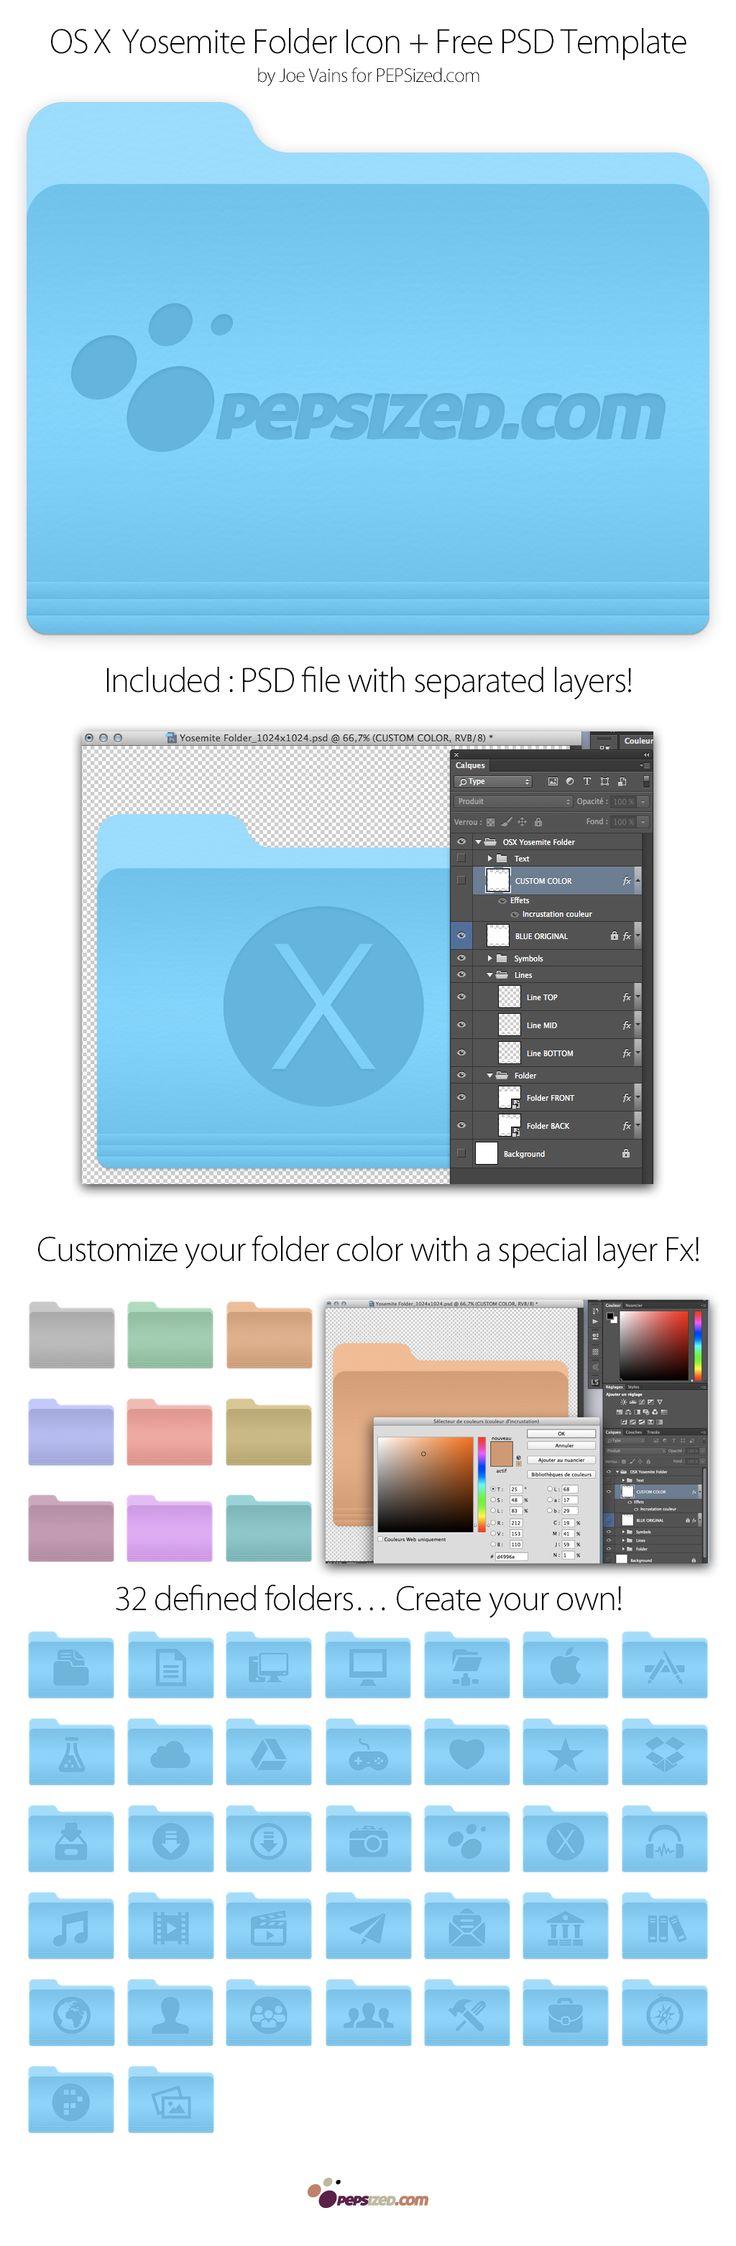 46 OSX Yosemite Folders Icons + PSD Template